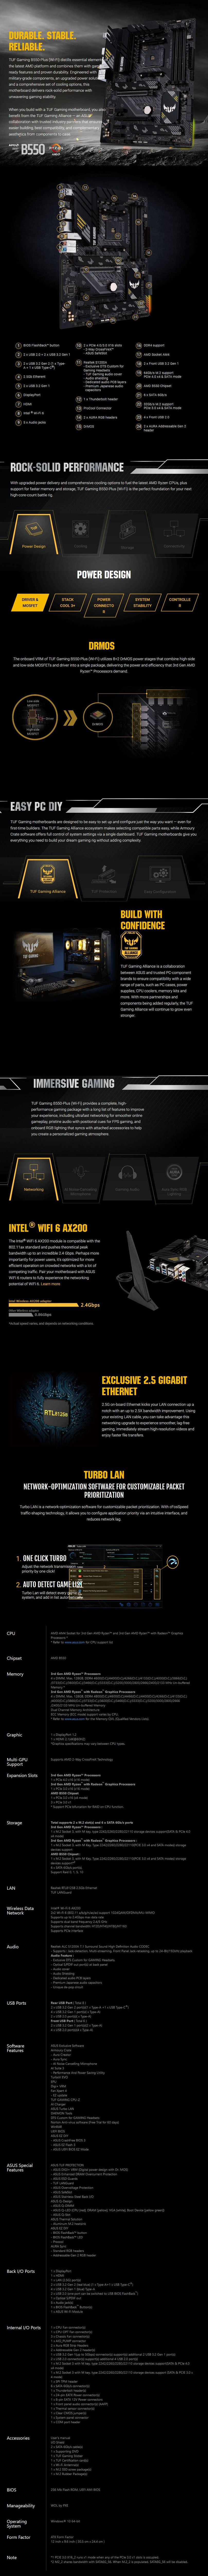 asus-tuf-gaming-b550plus-wifi-am4-atx-motherboard-ac36456-8.jpg